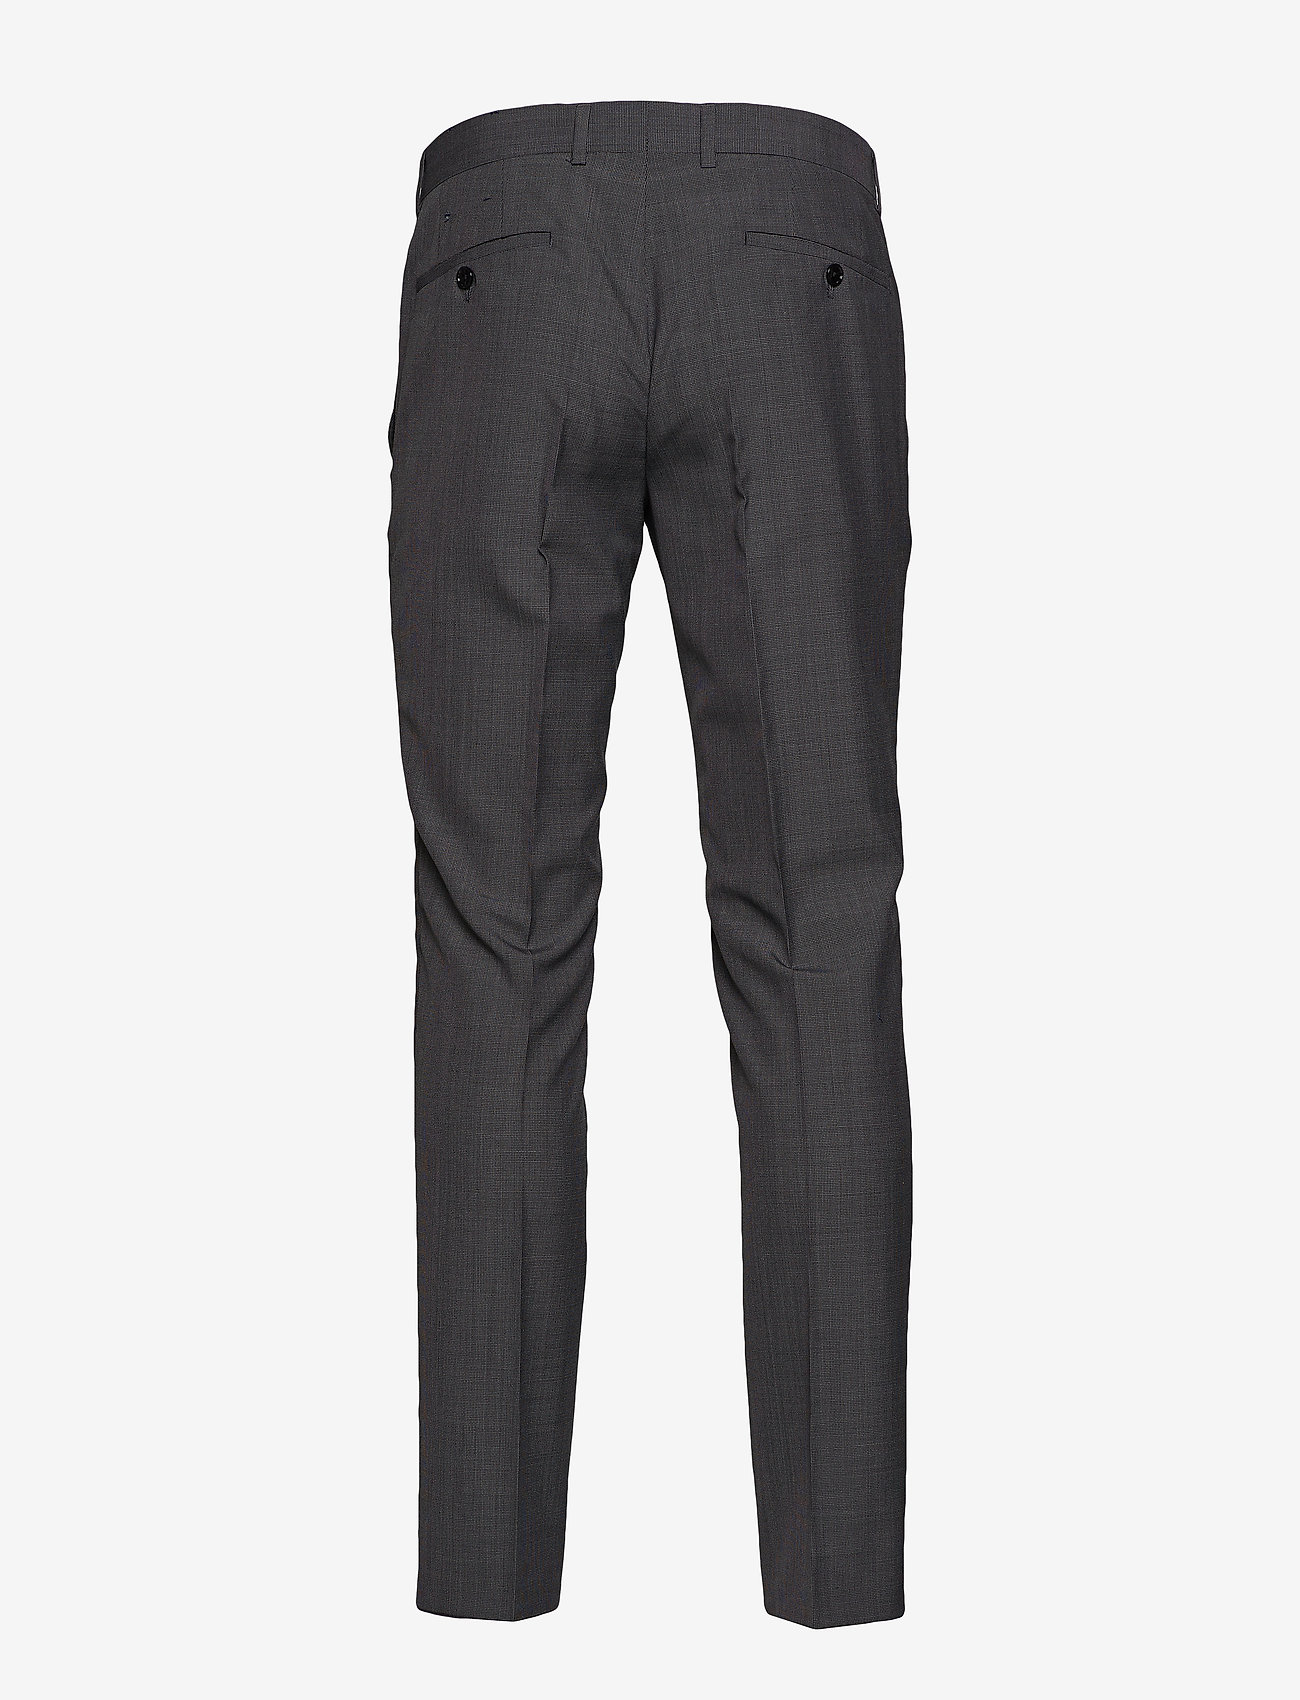 Esprit Collection Pants Suit - Byxor Dark Grey 5